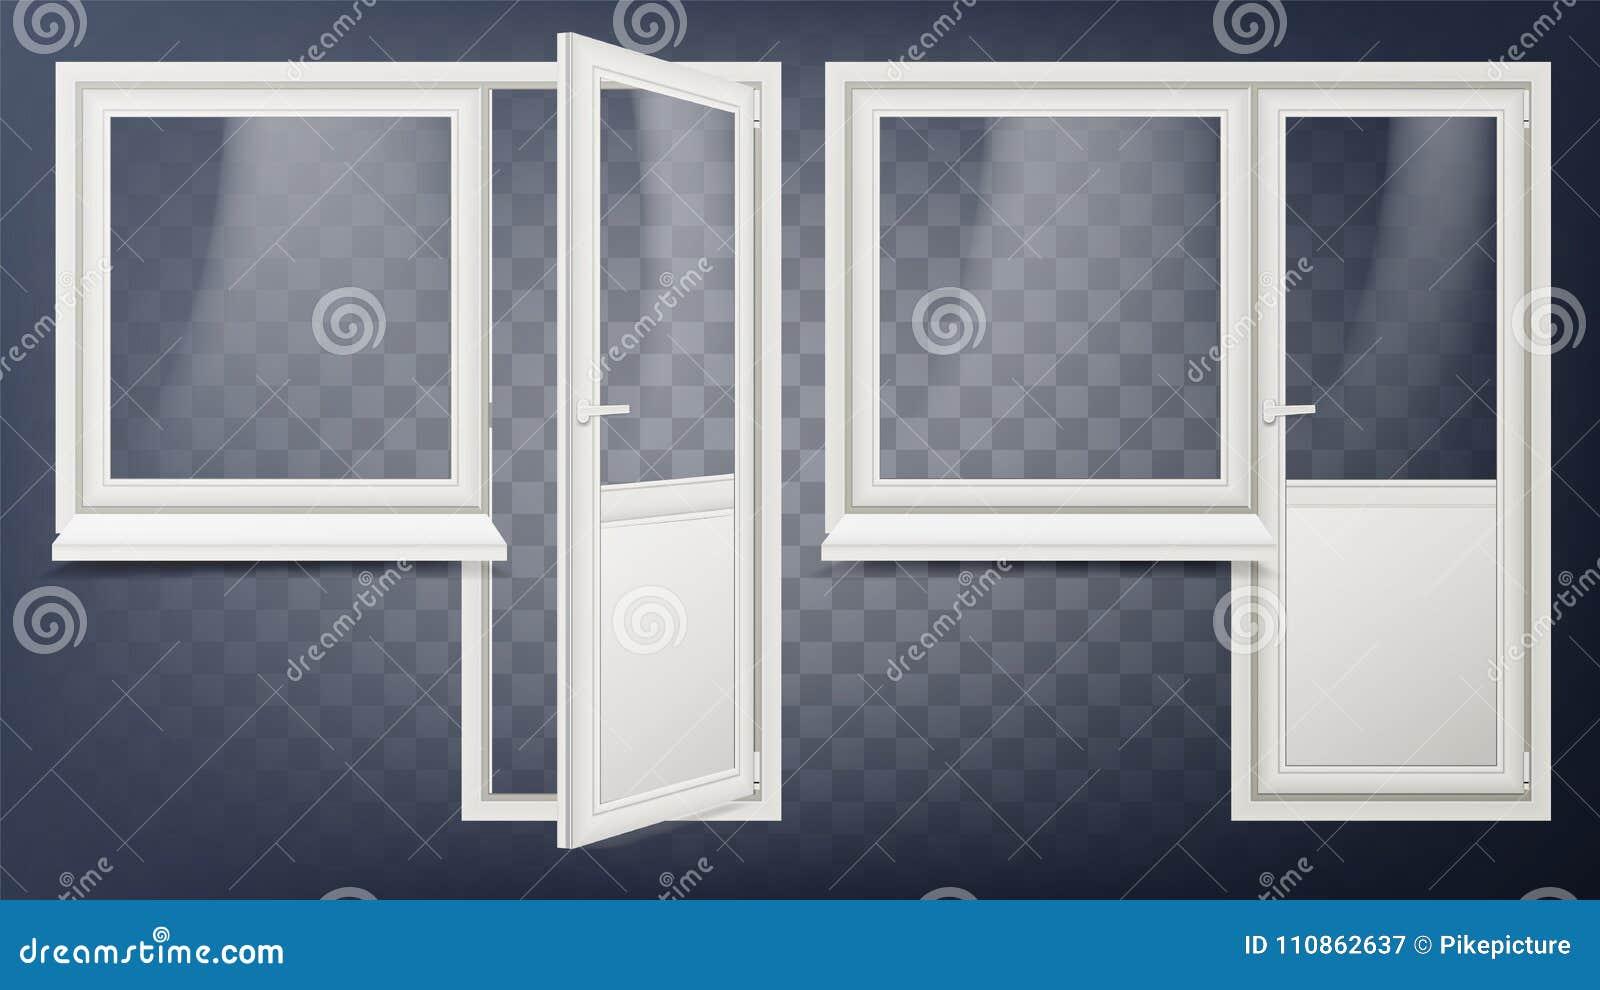 Energy-saving glass for plastic windows 44